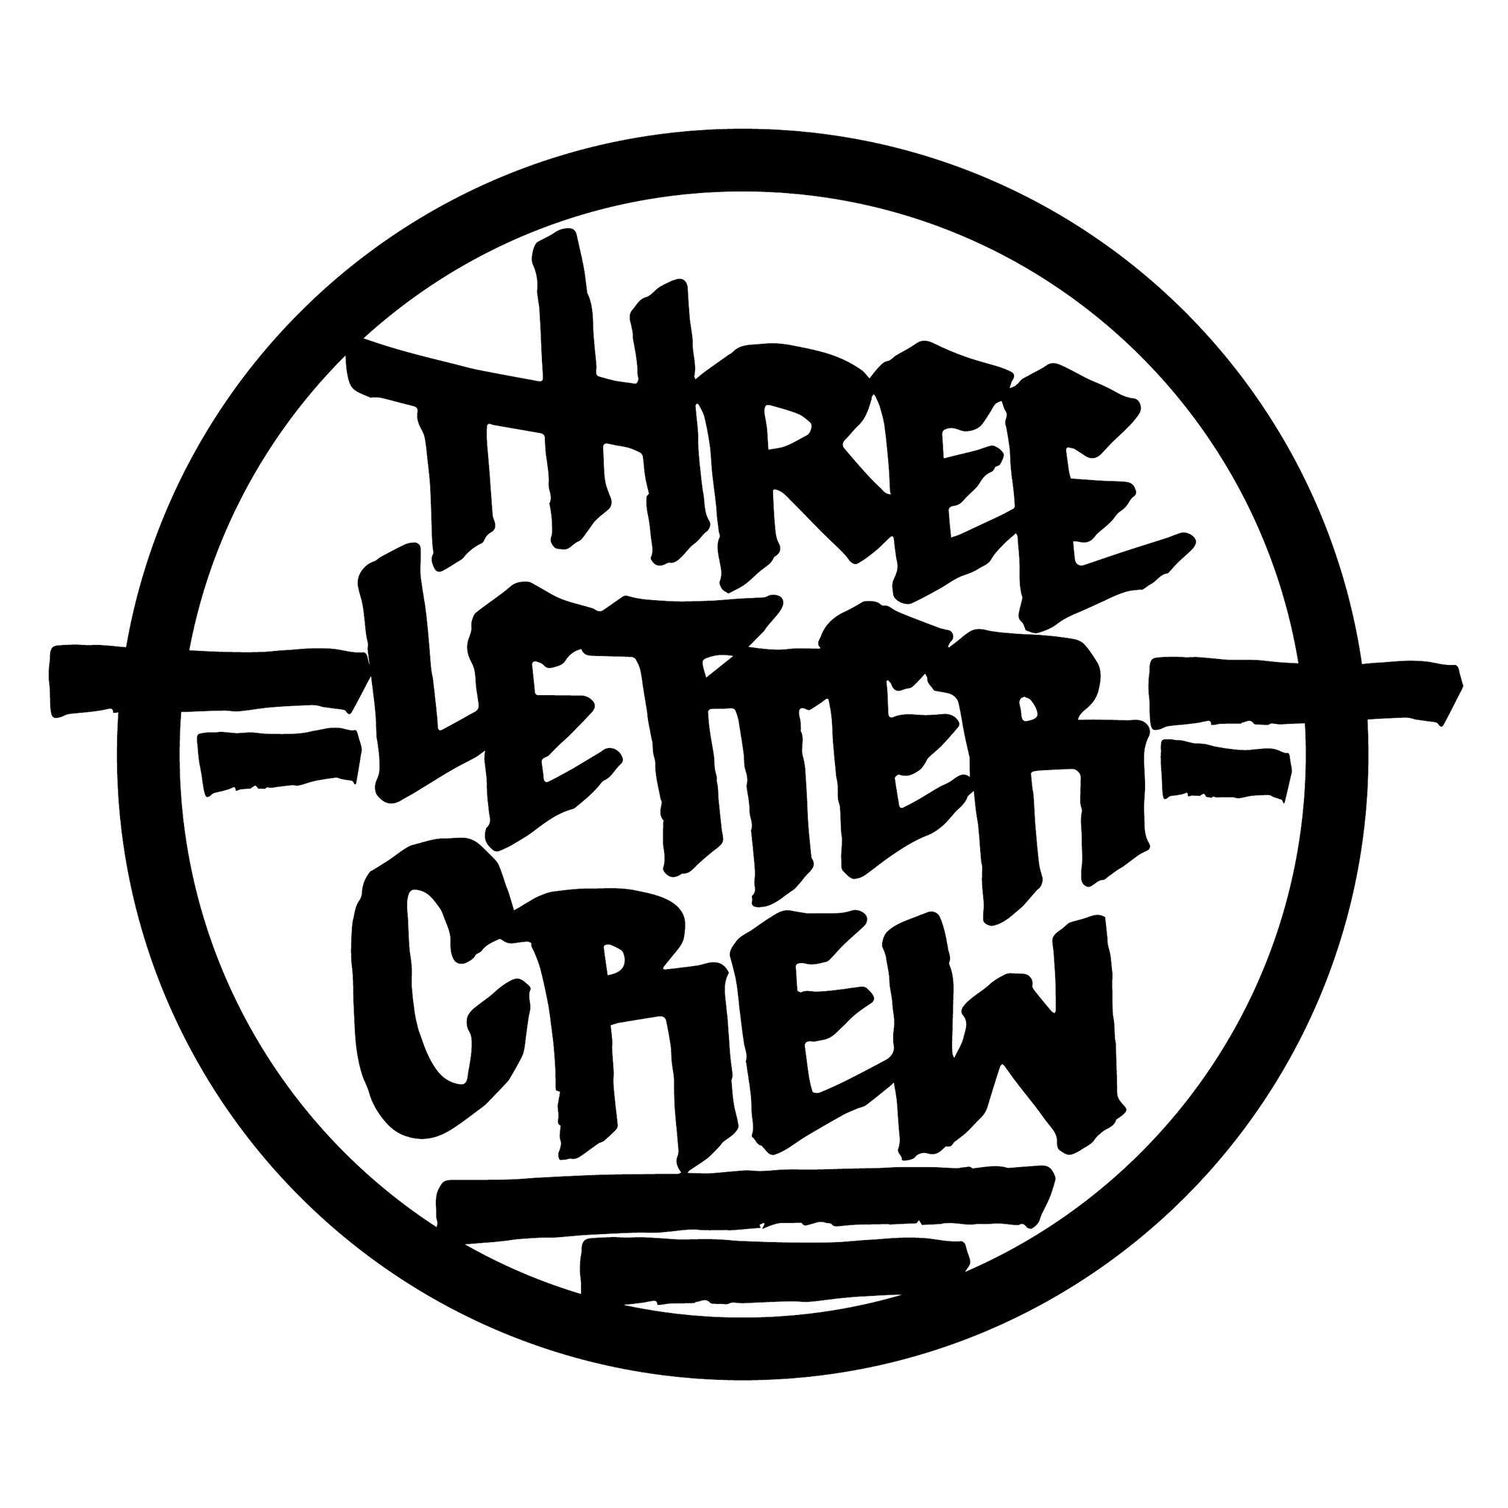 Three Letter Crew